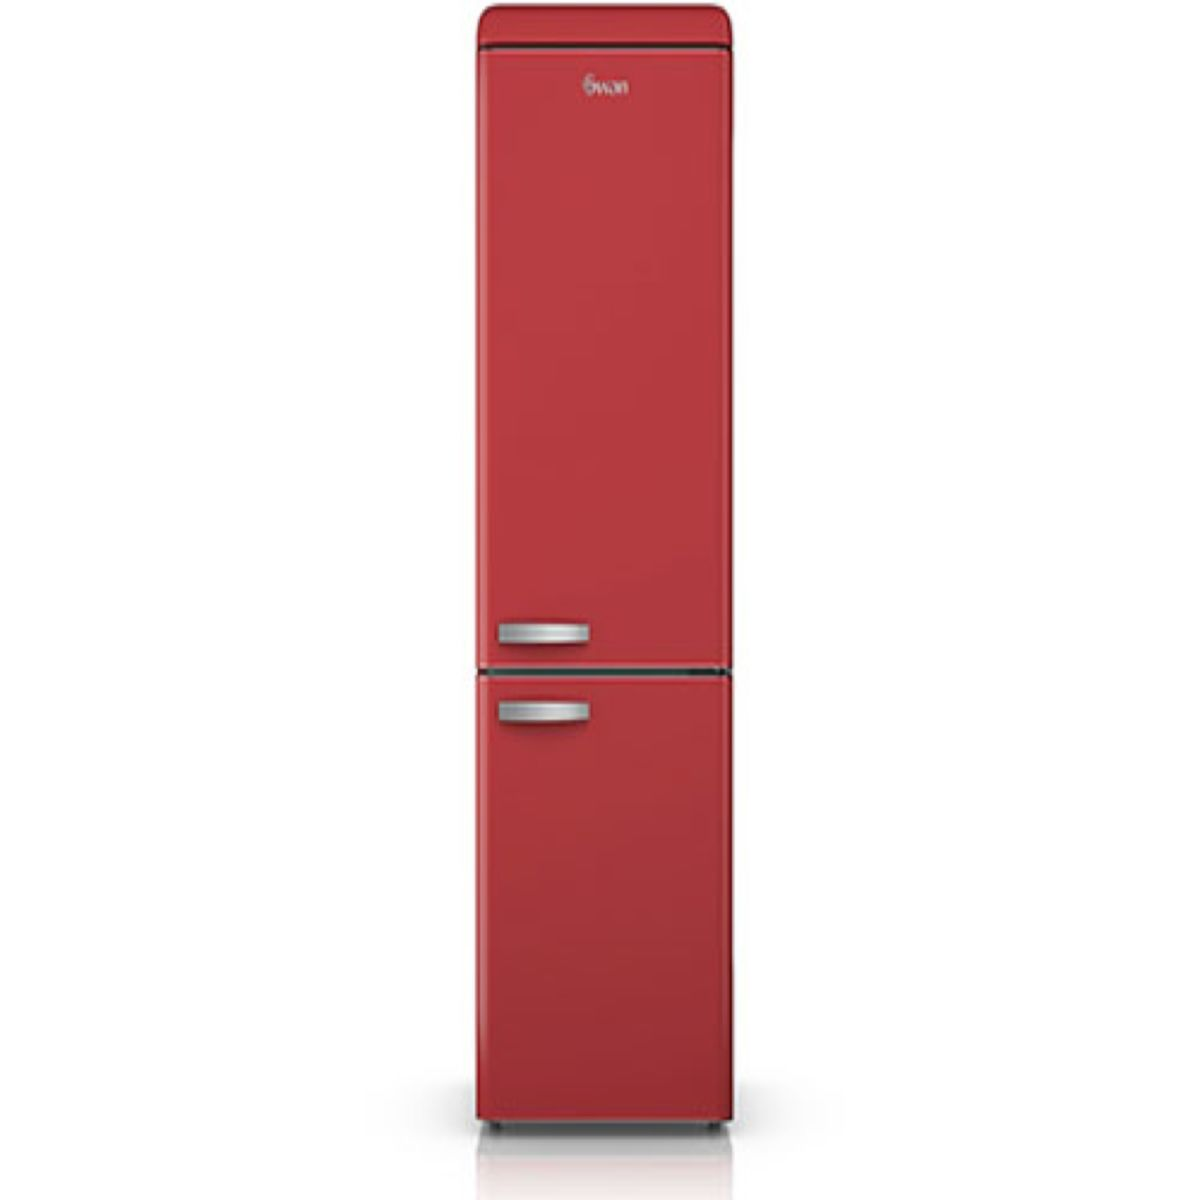 Swan SR11020RN Retro Fridge Freezer - Red